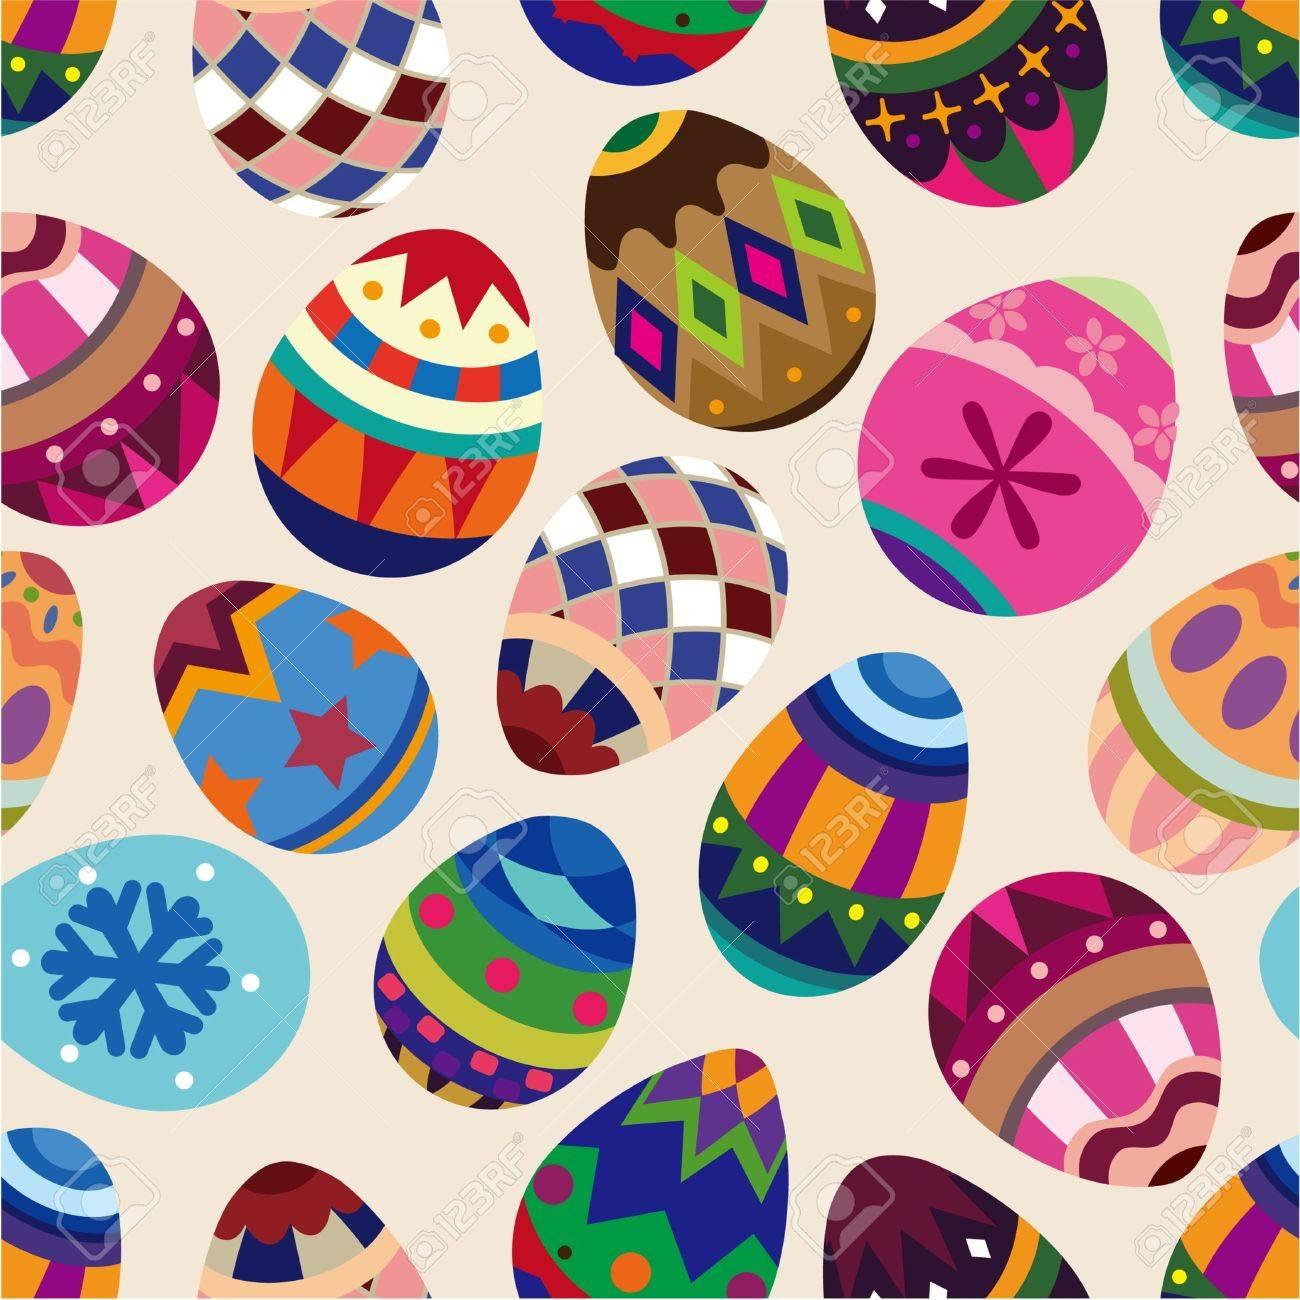 Easter Egg Pattern Background - More info